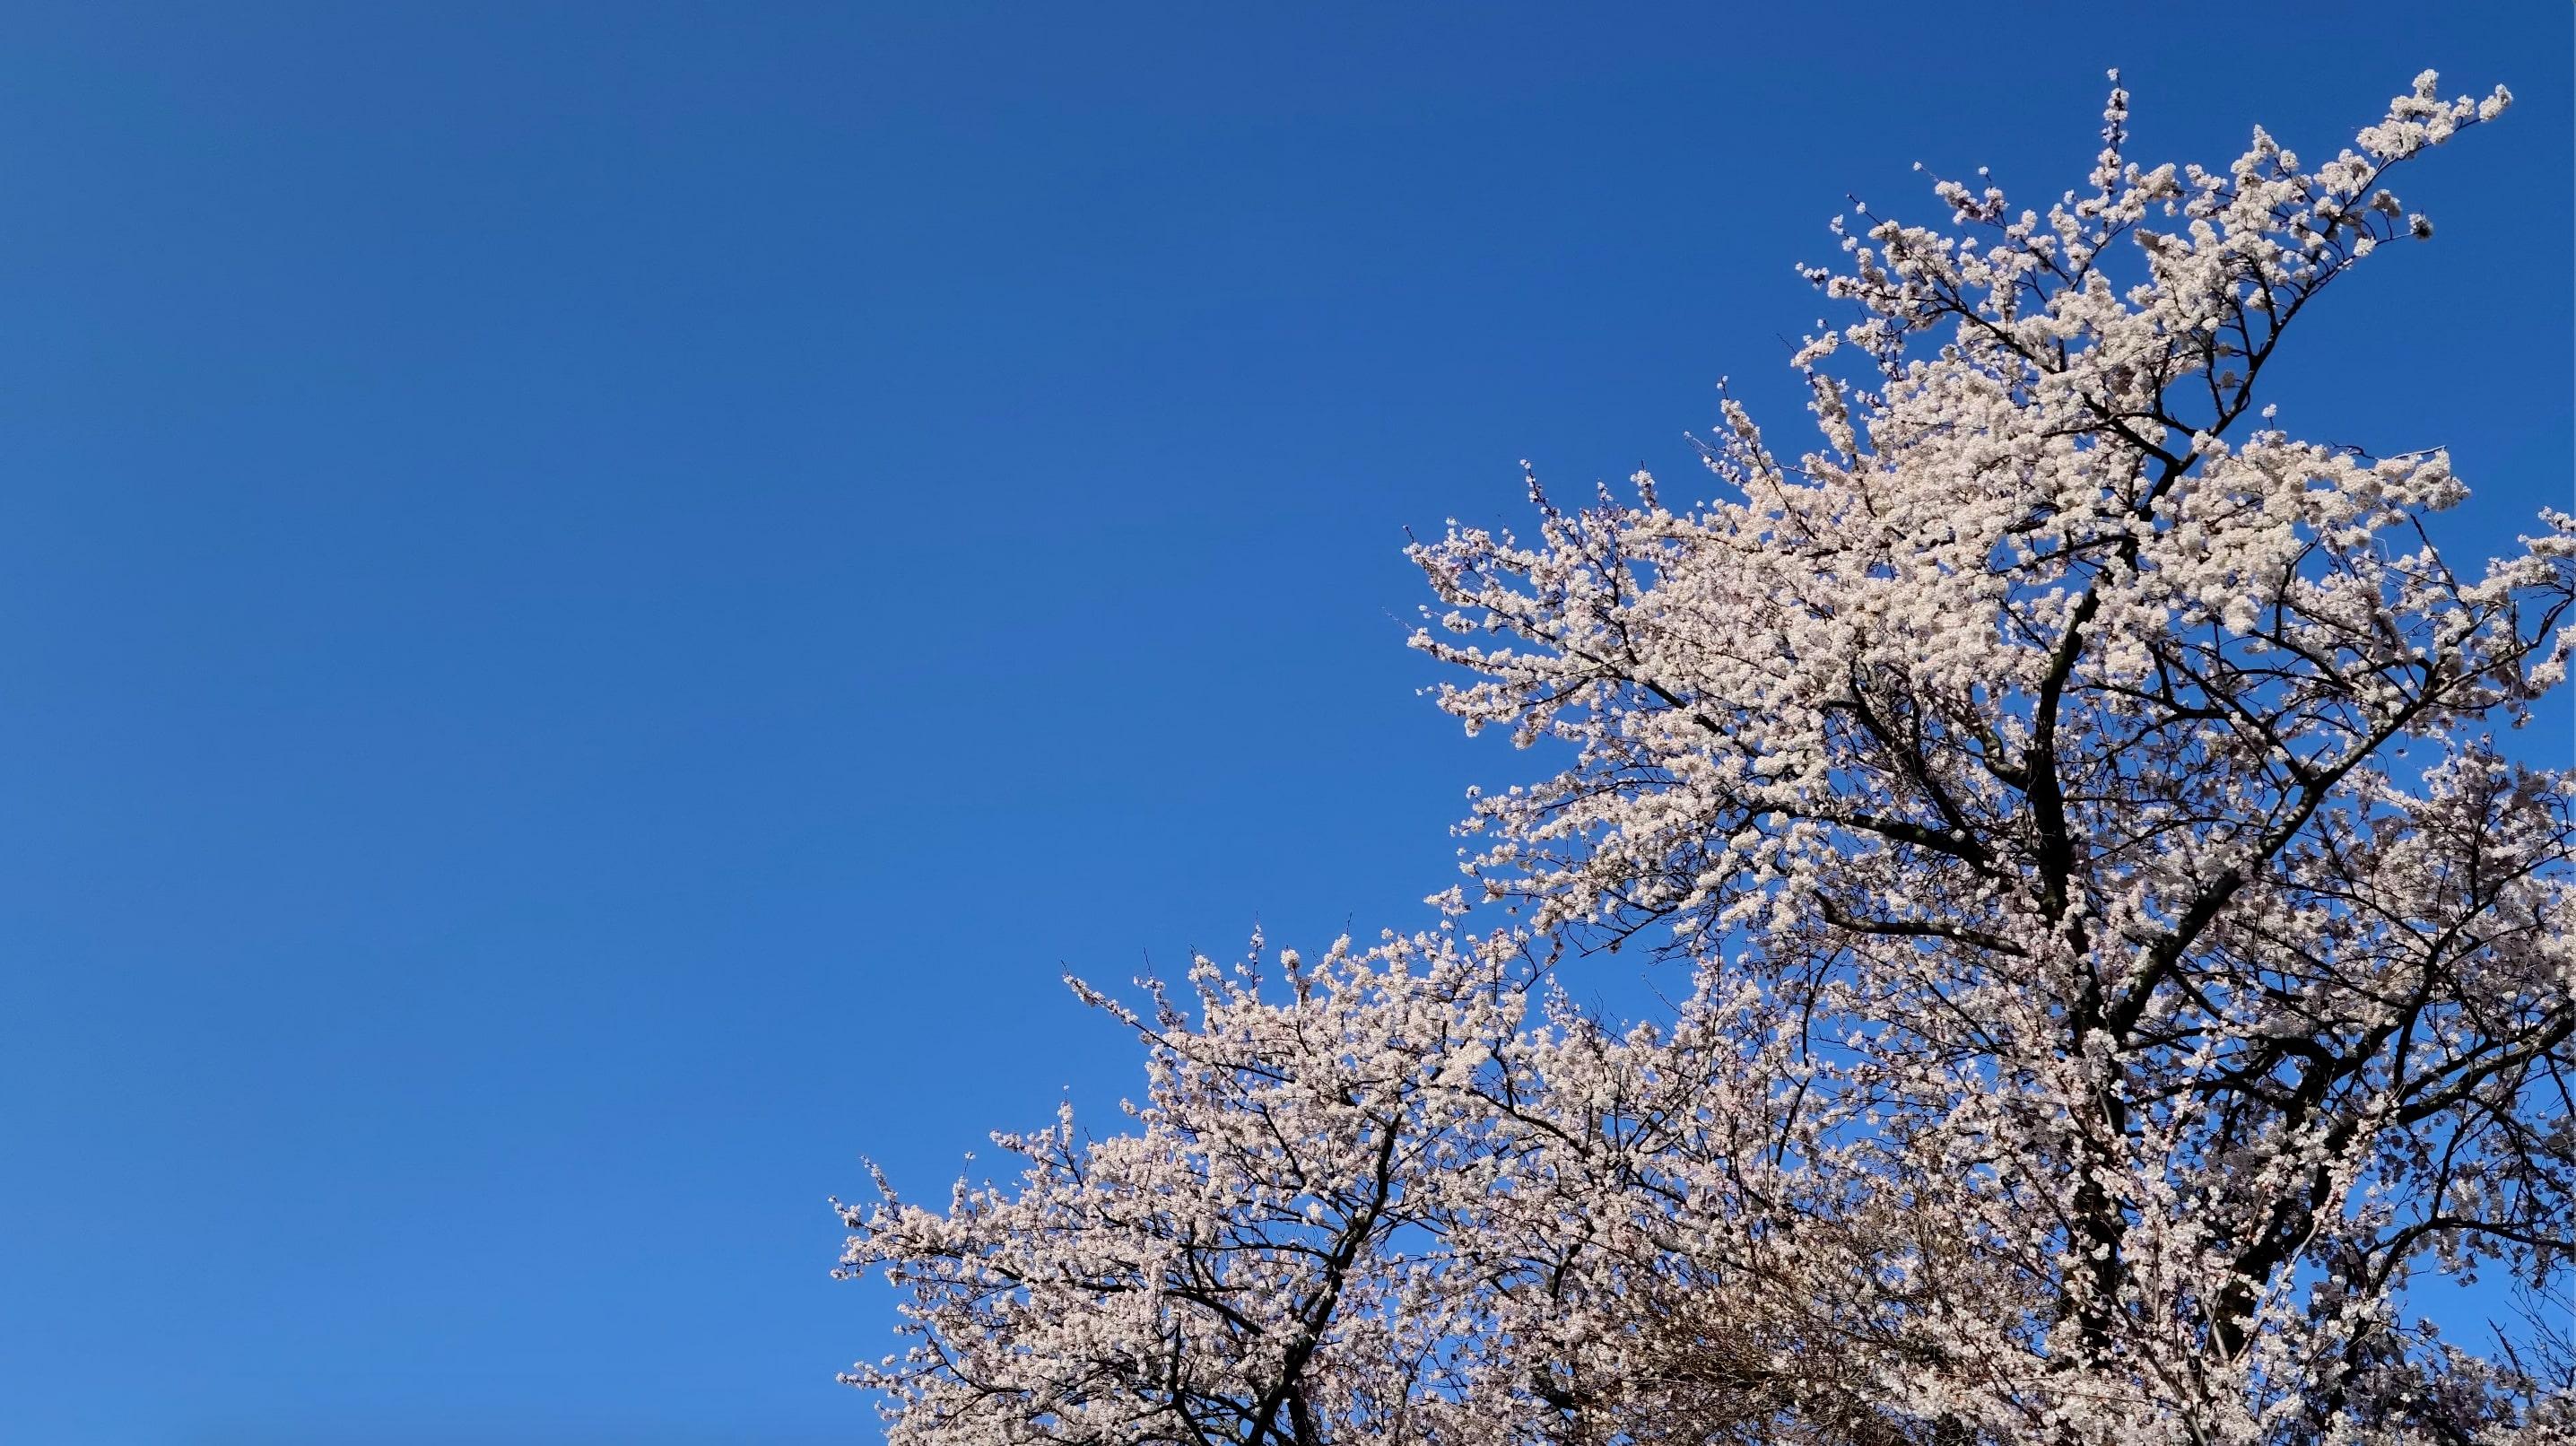 8K/4K映像/ハイビジョン映像素材集の桜の動画のキャプチャ